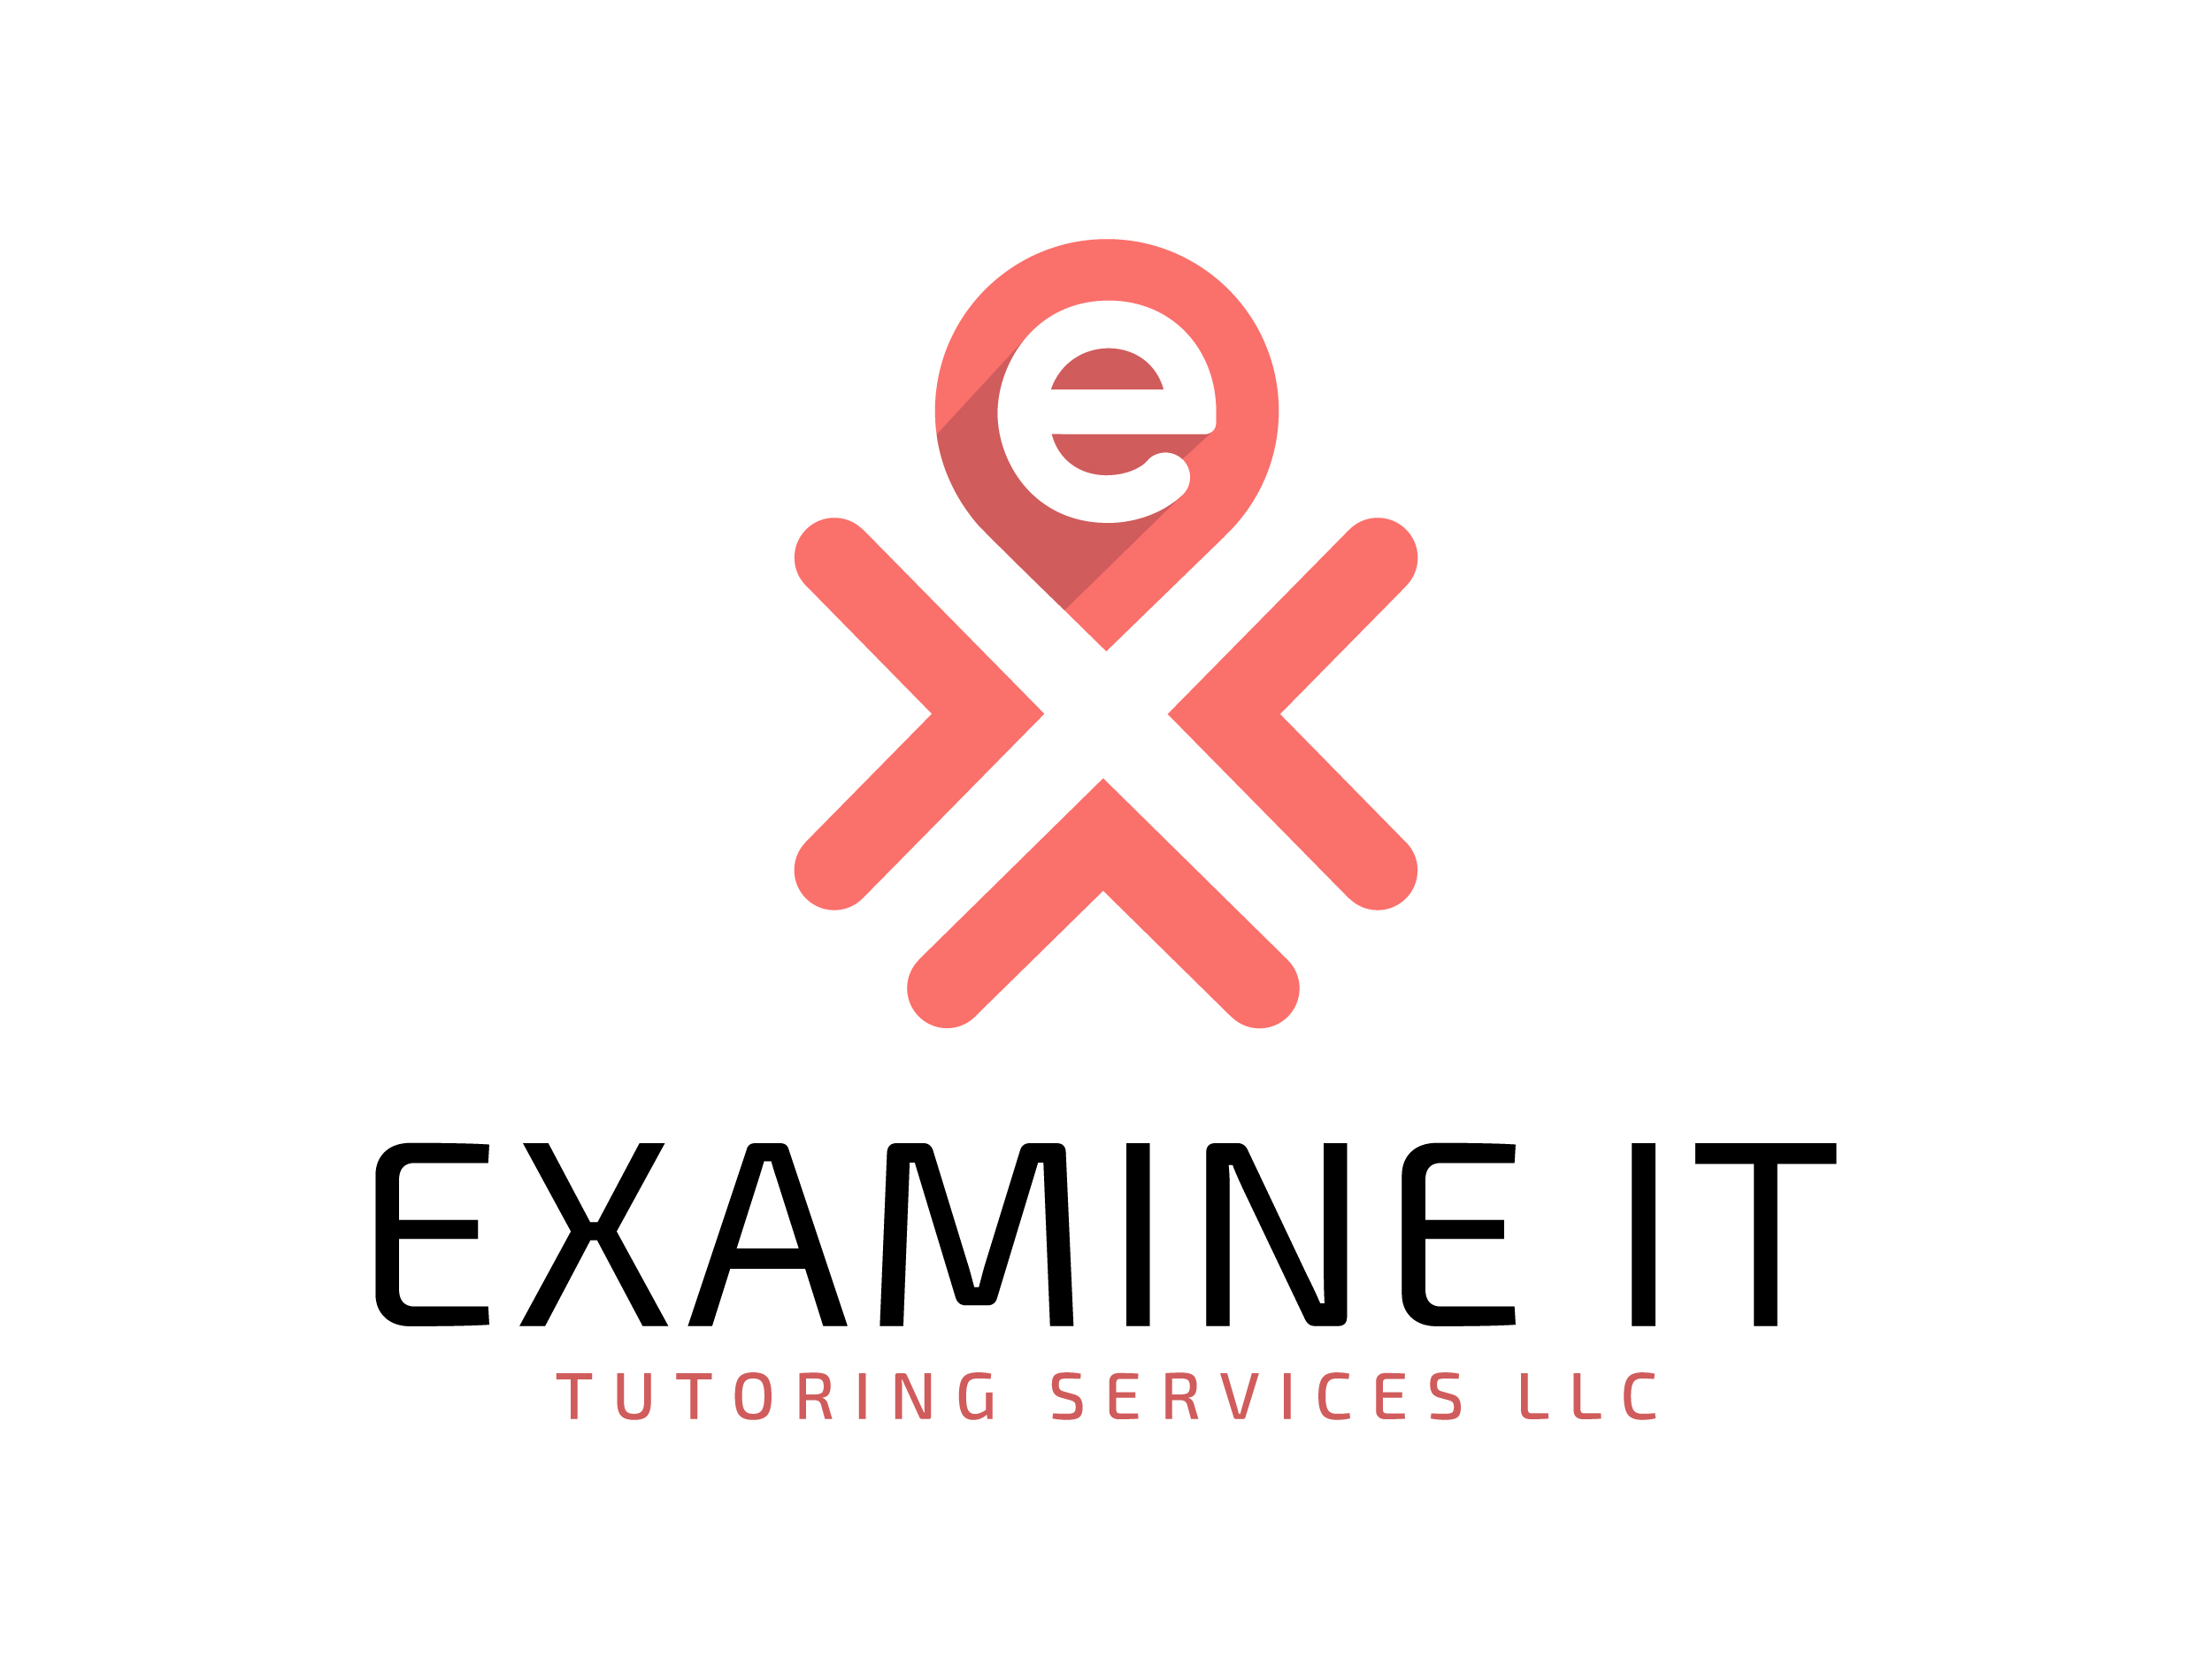 Examine-IT-logo-2500x1875px.jpg